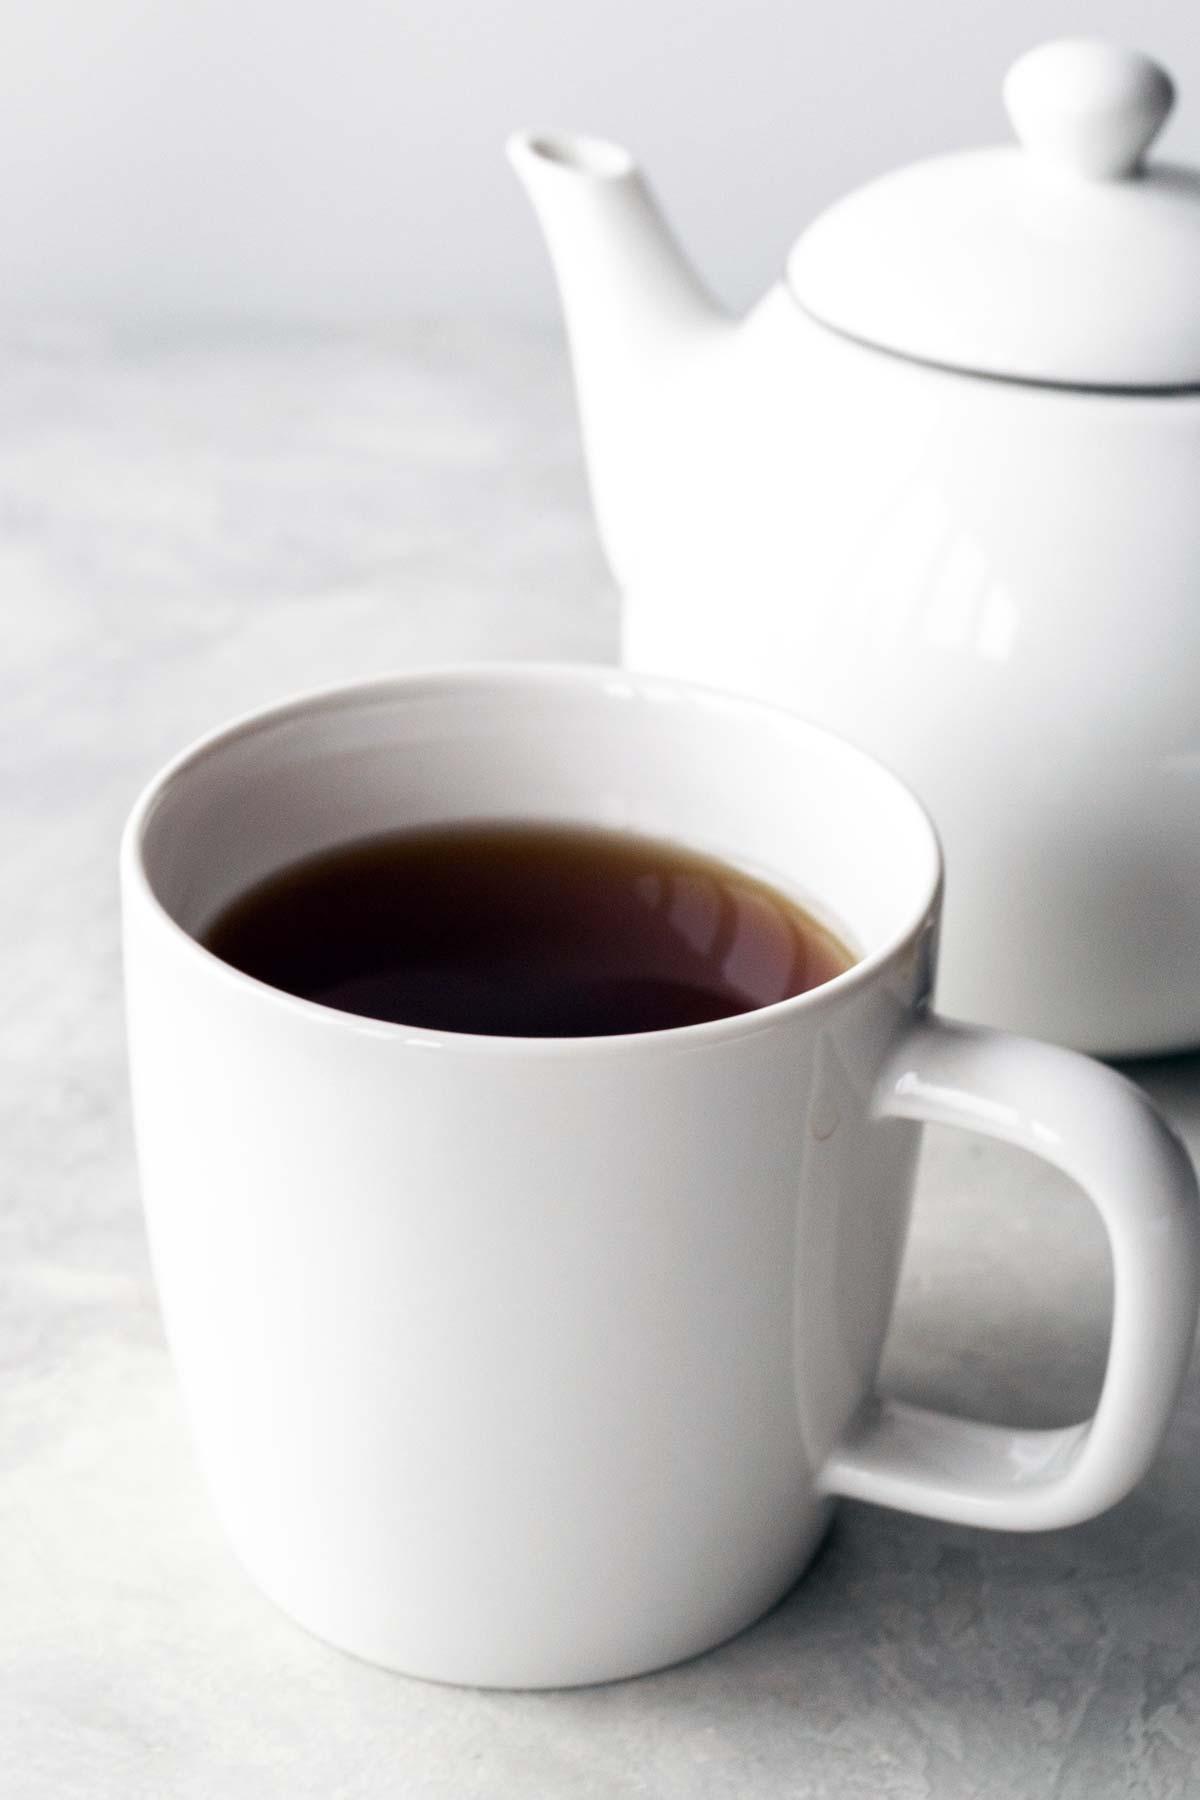 English Breakfast tea in a mug.